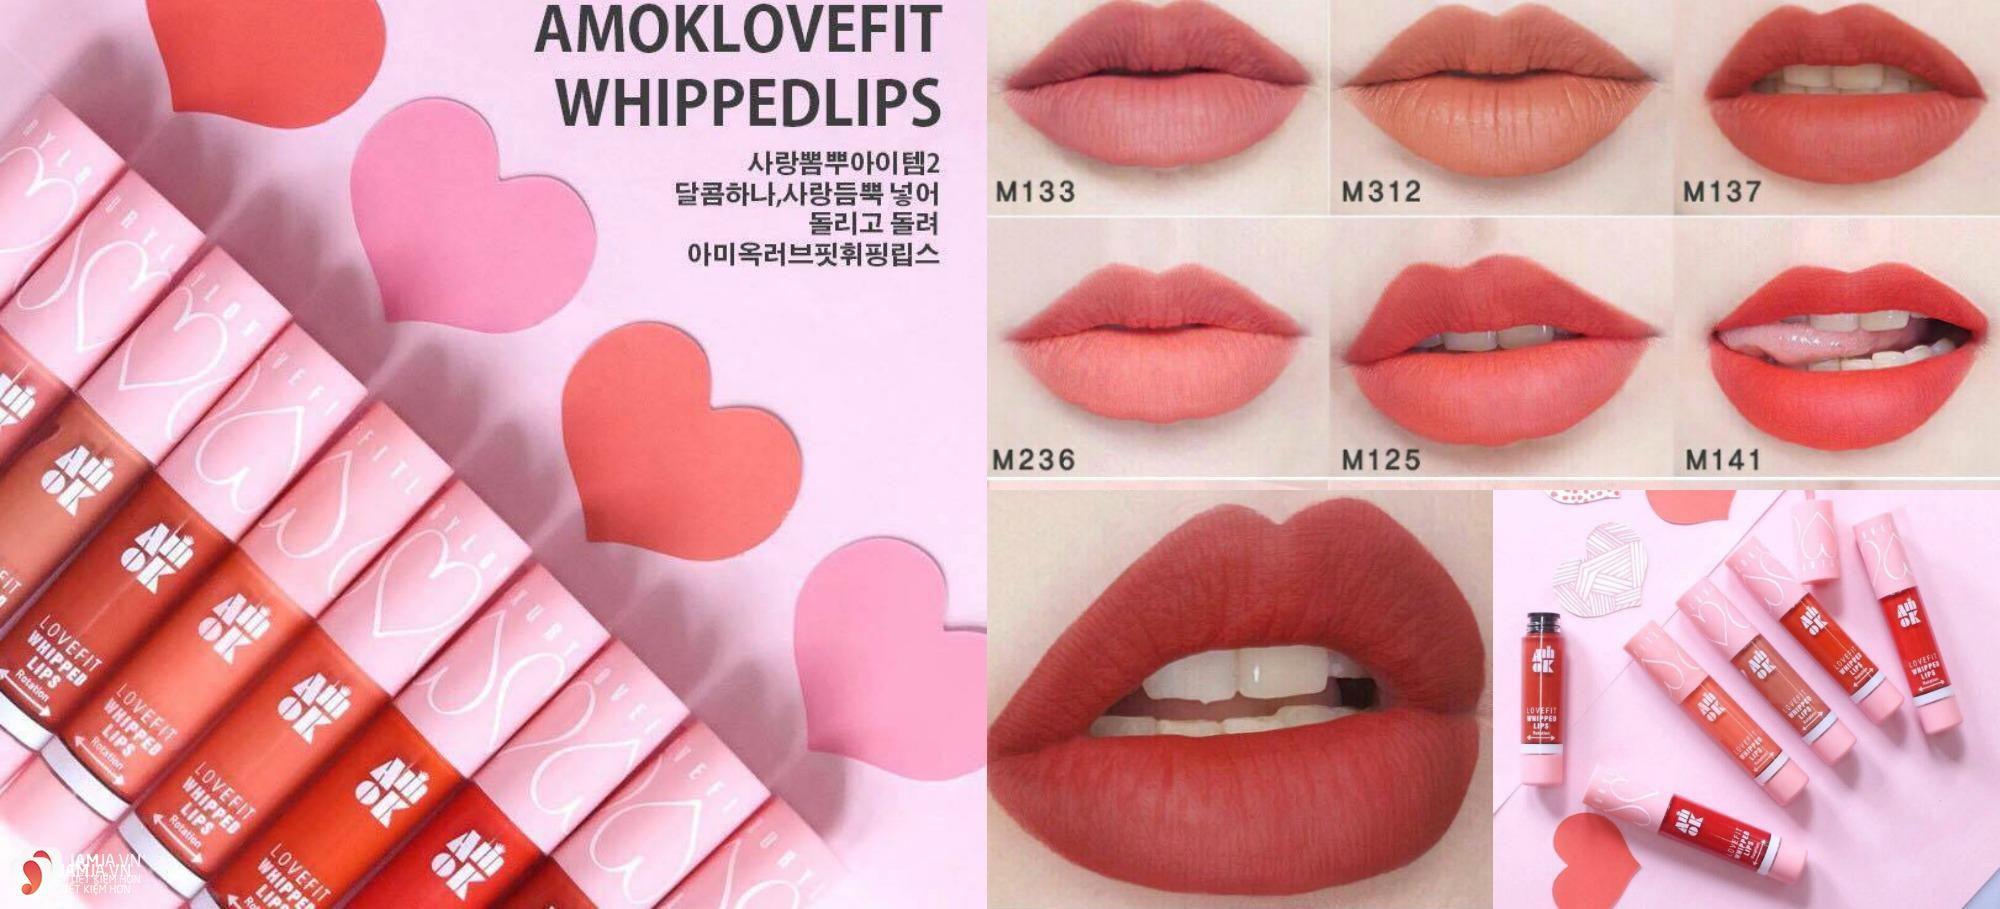 bảng màu Amok Lovefit Whipped Lips 2